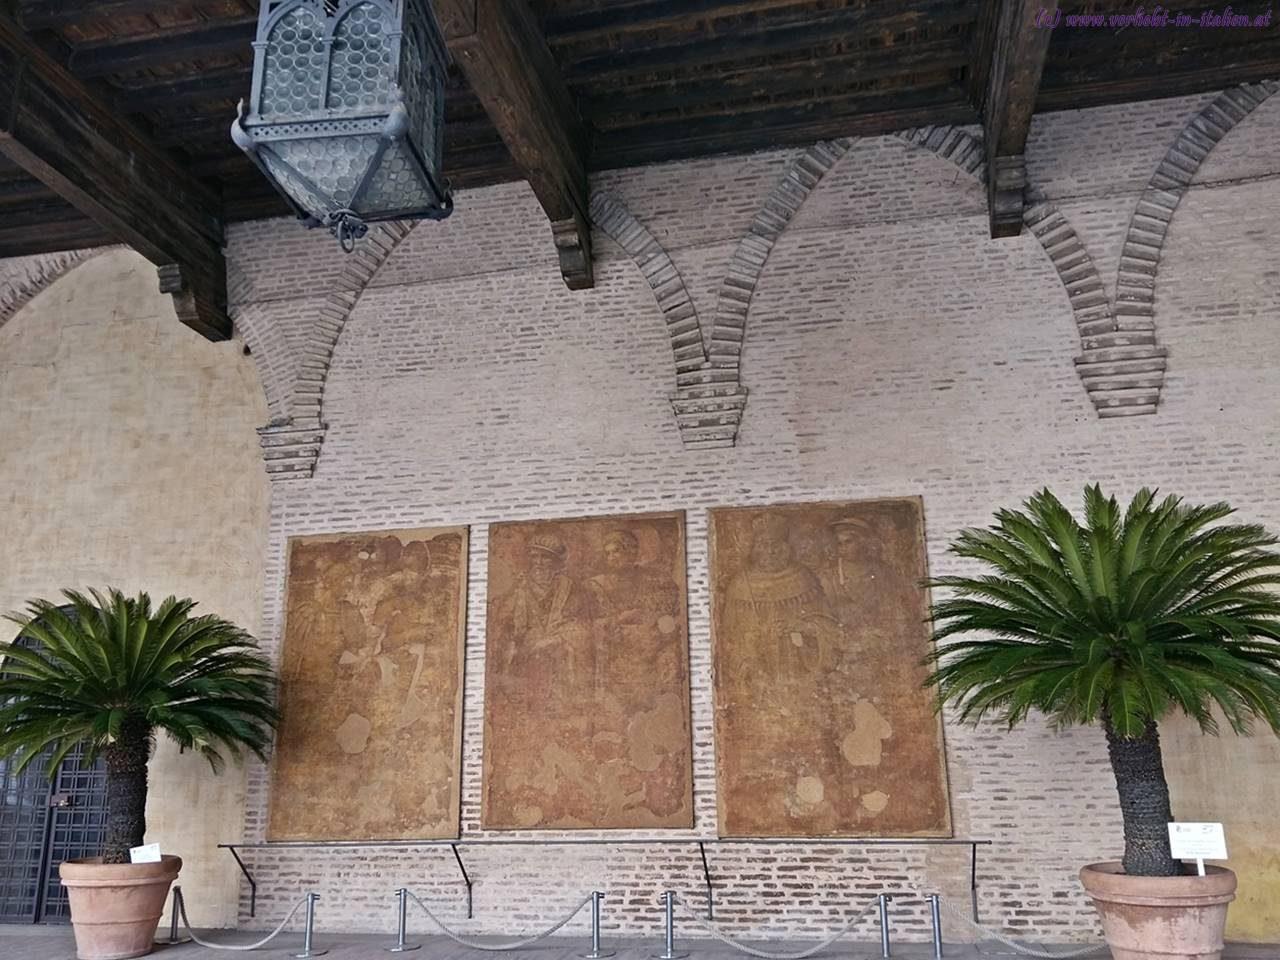 Wandtafeln im Innenhof